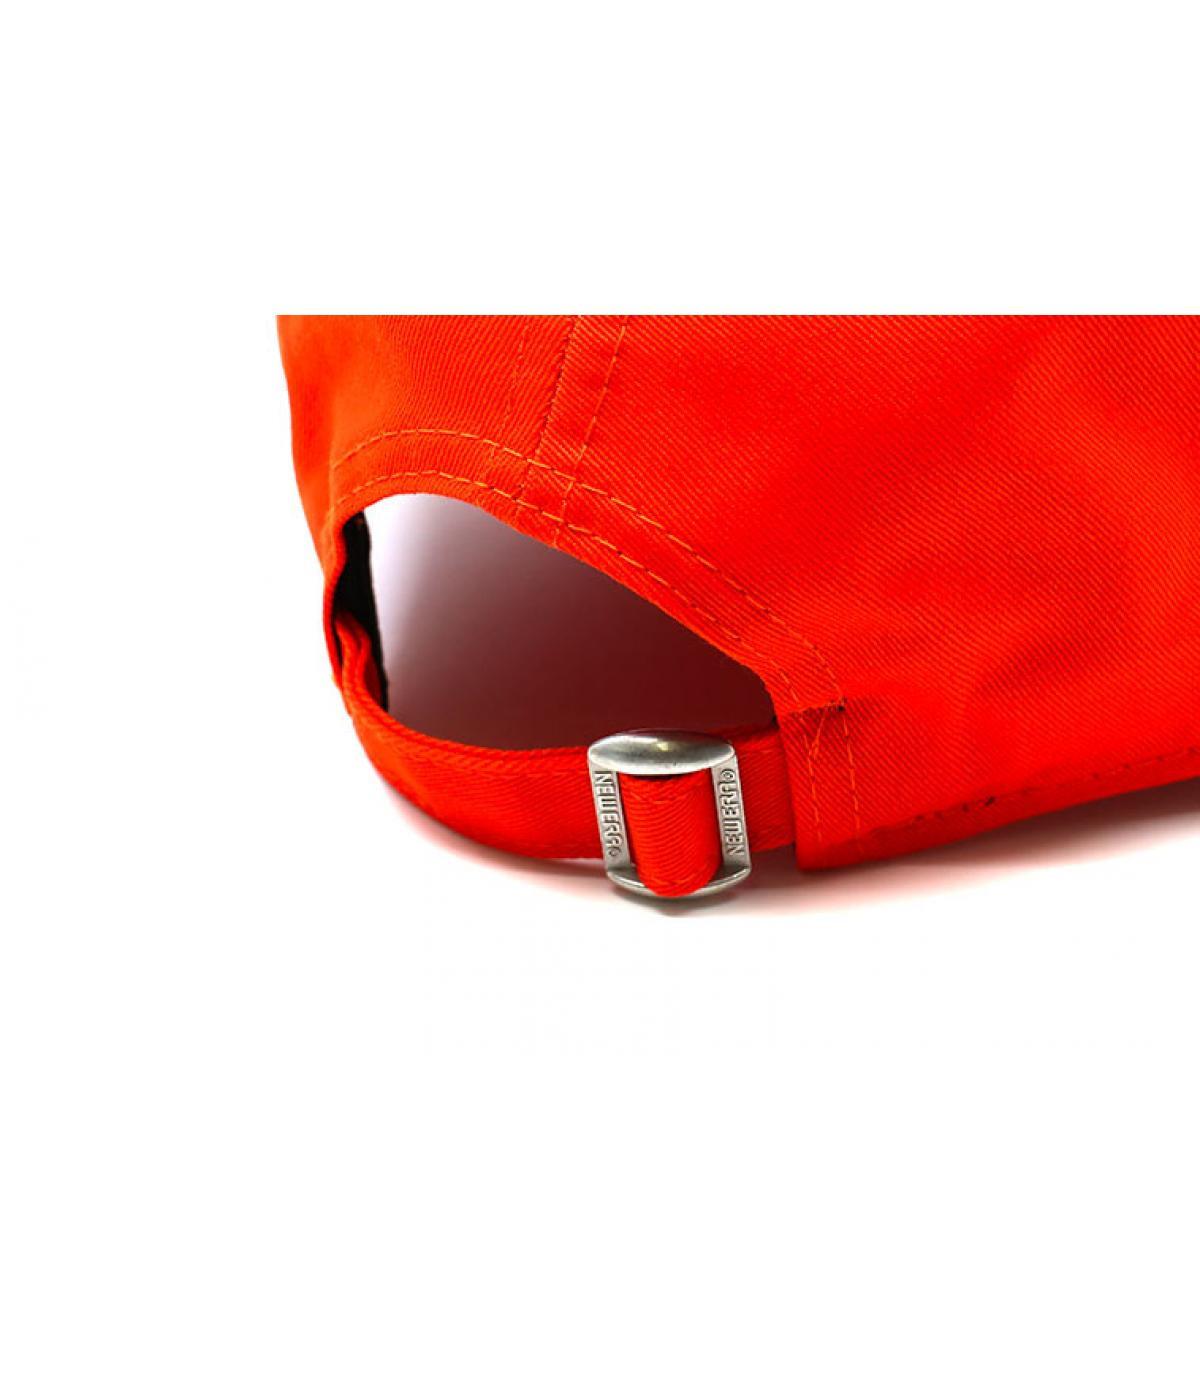 Details League Ess 9Forty NY orange - afbeeling 5